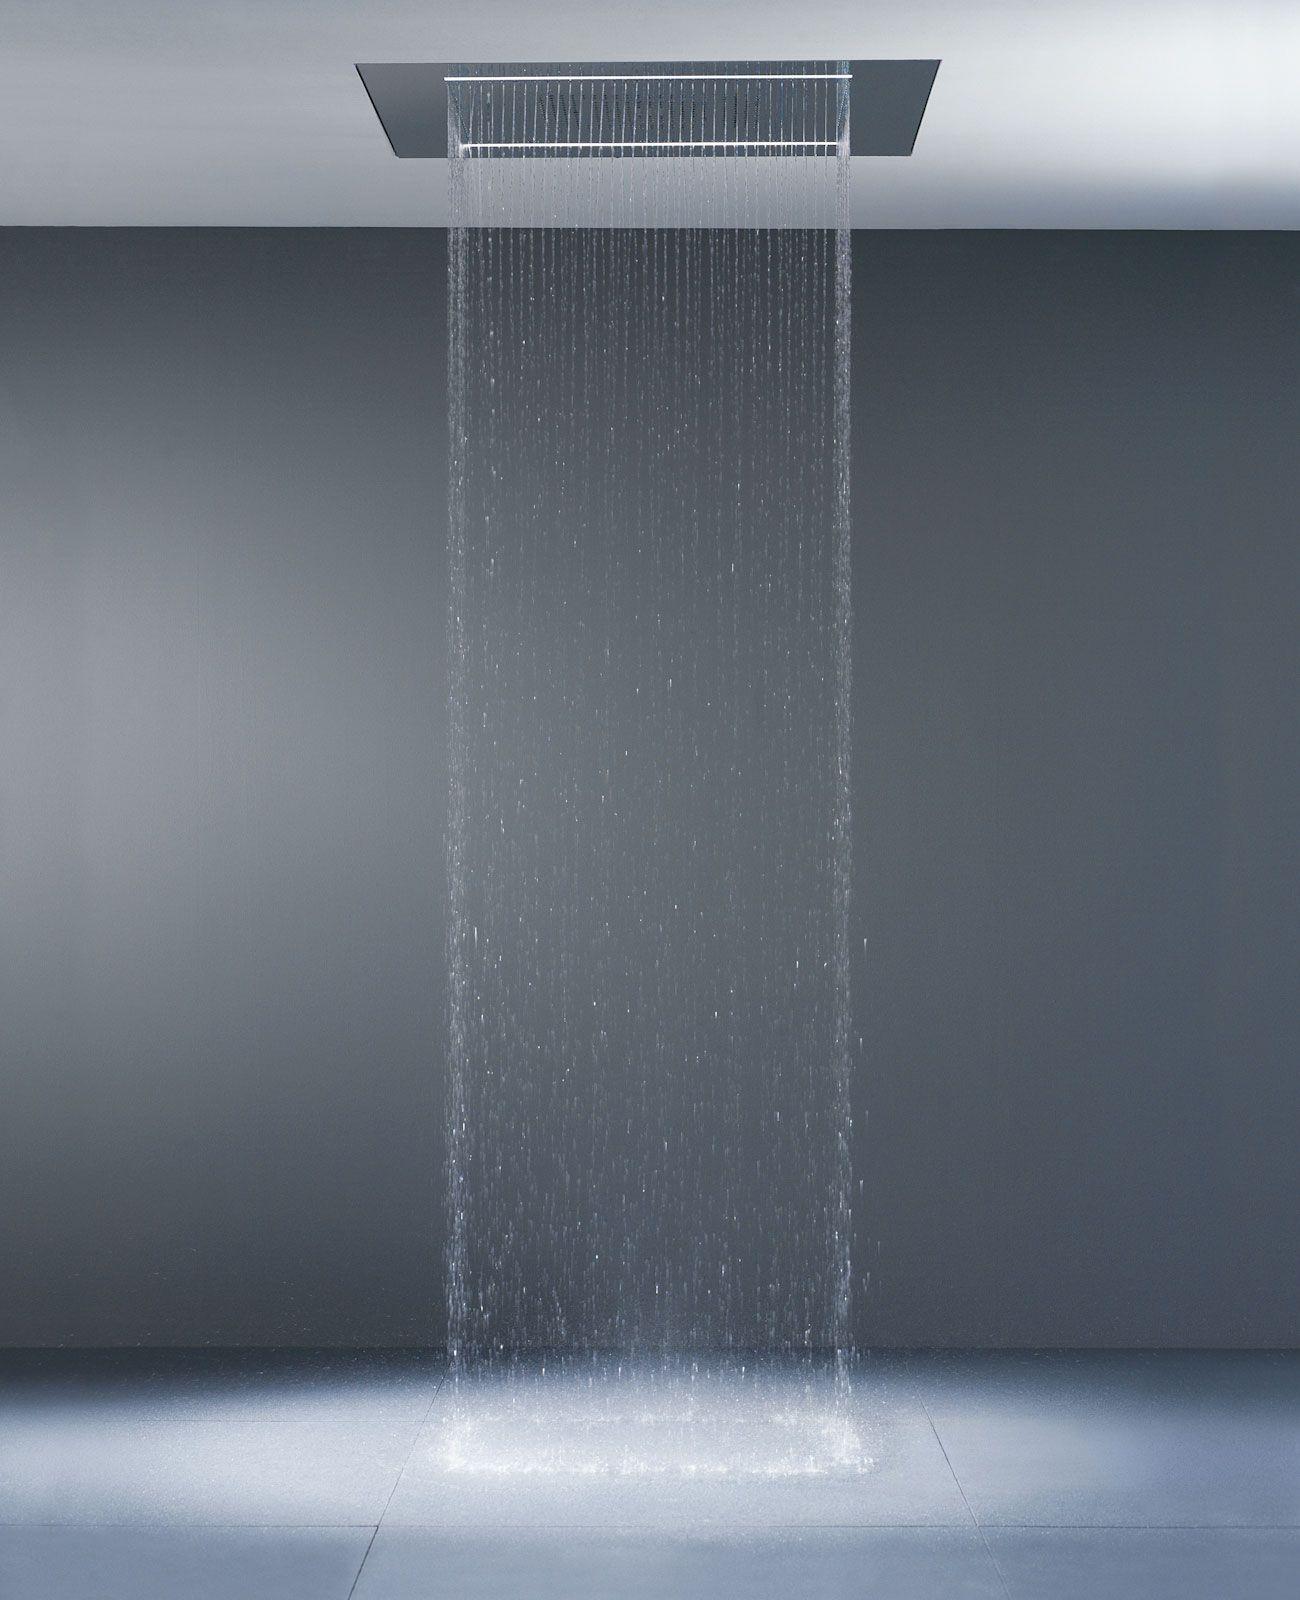 Balance Modules   RainSky E   Bath   Spa   Shower panel   DornbrachtBalance Modules   RainSky E   Bath   Spa   Shower panel  . Tropical Rain Shower Head. Home Design Ideas